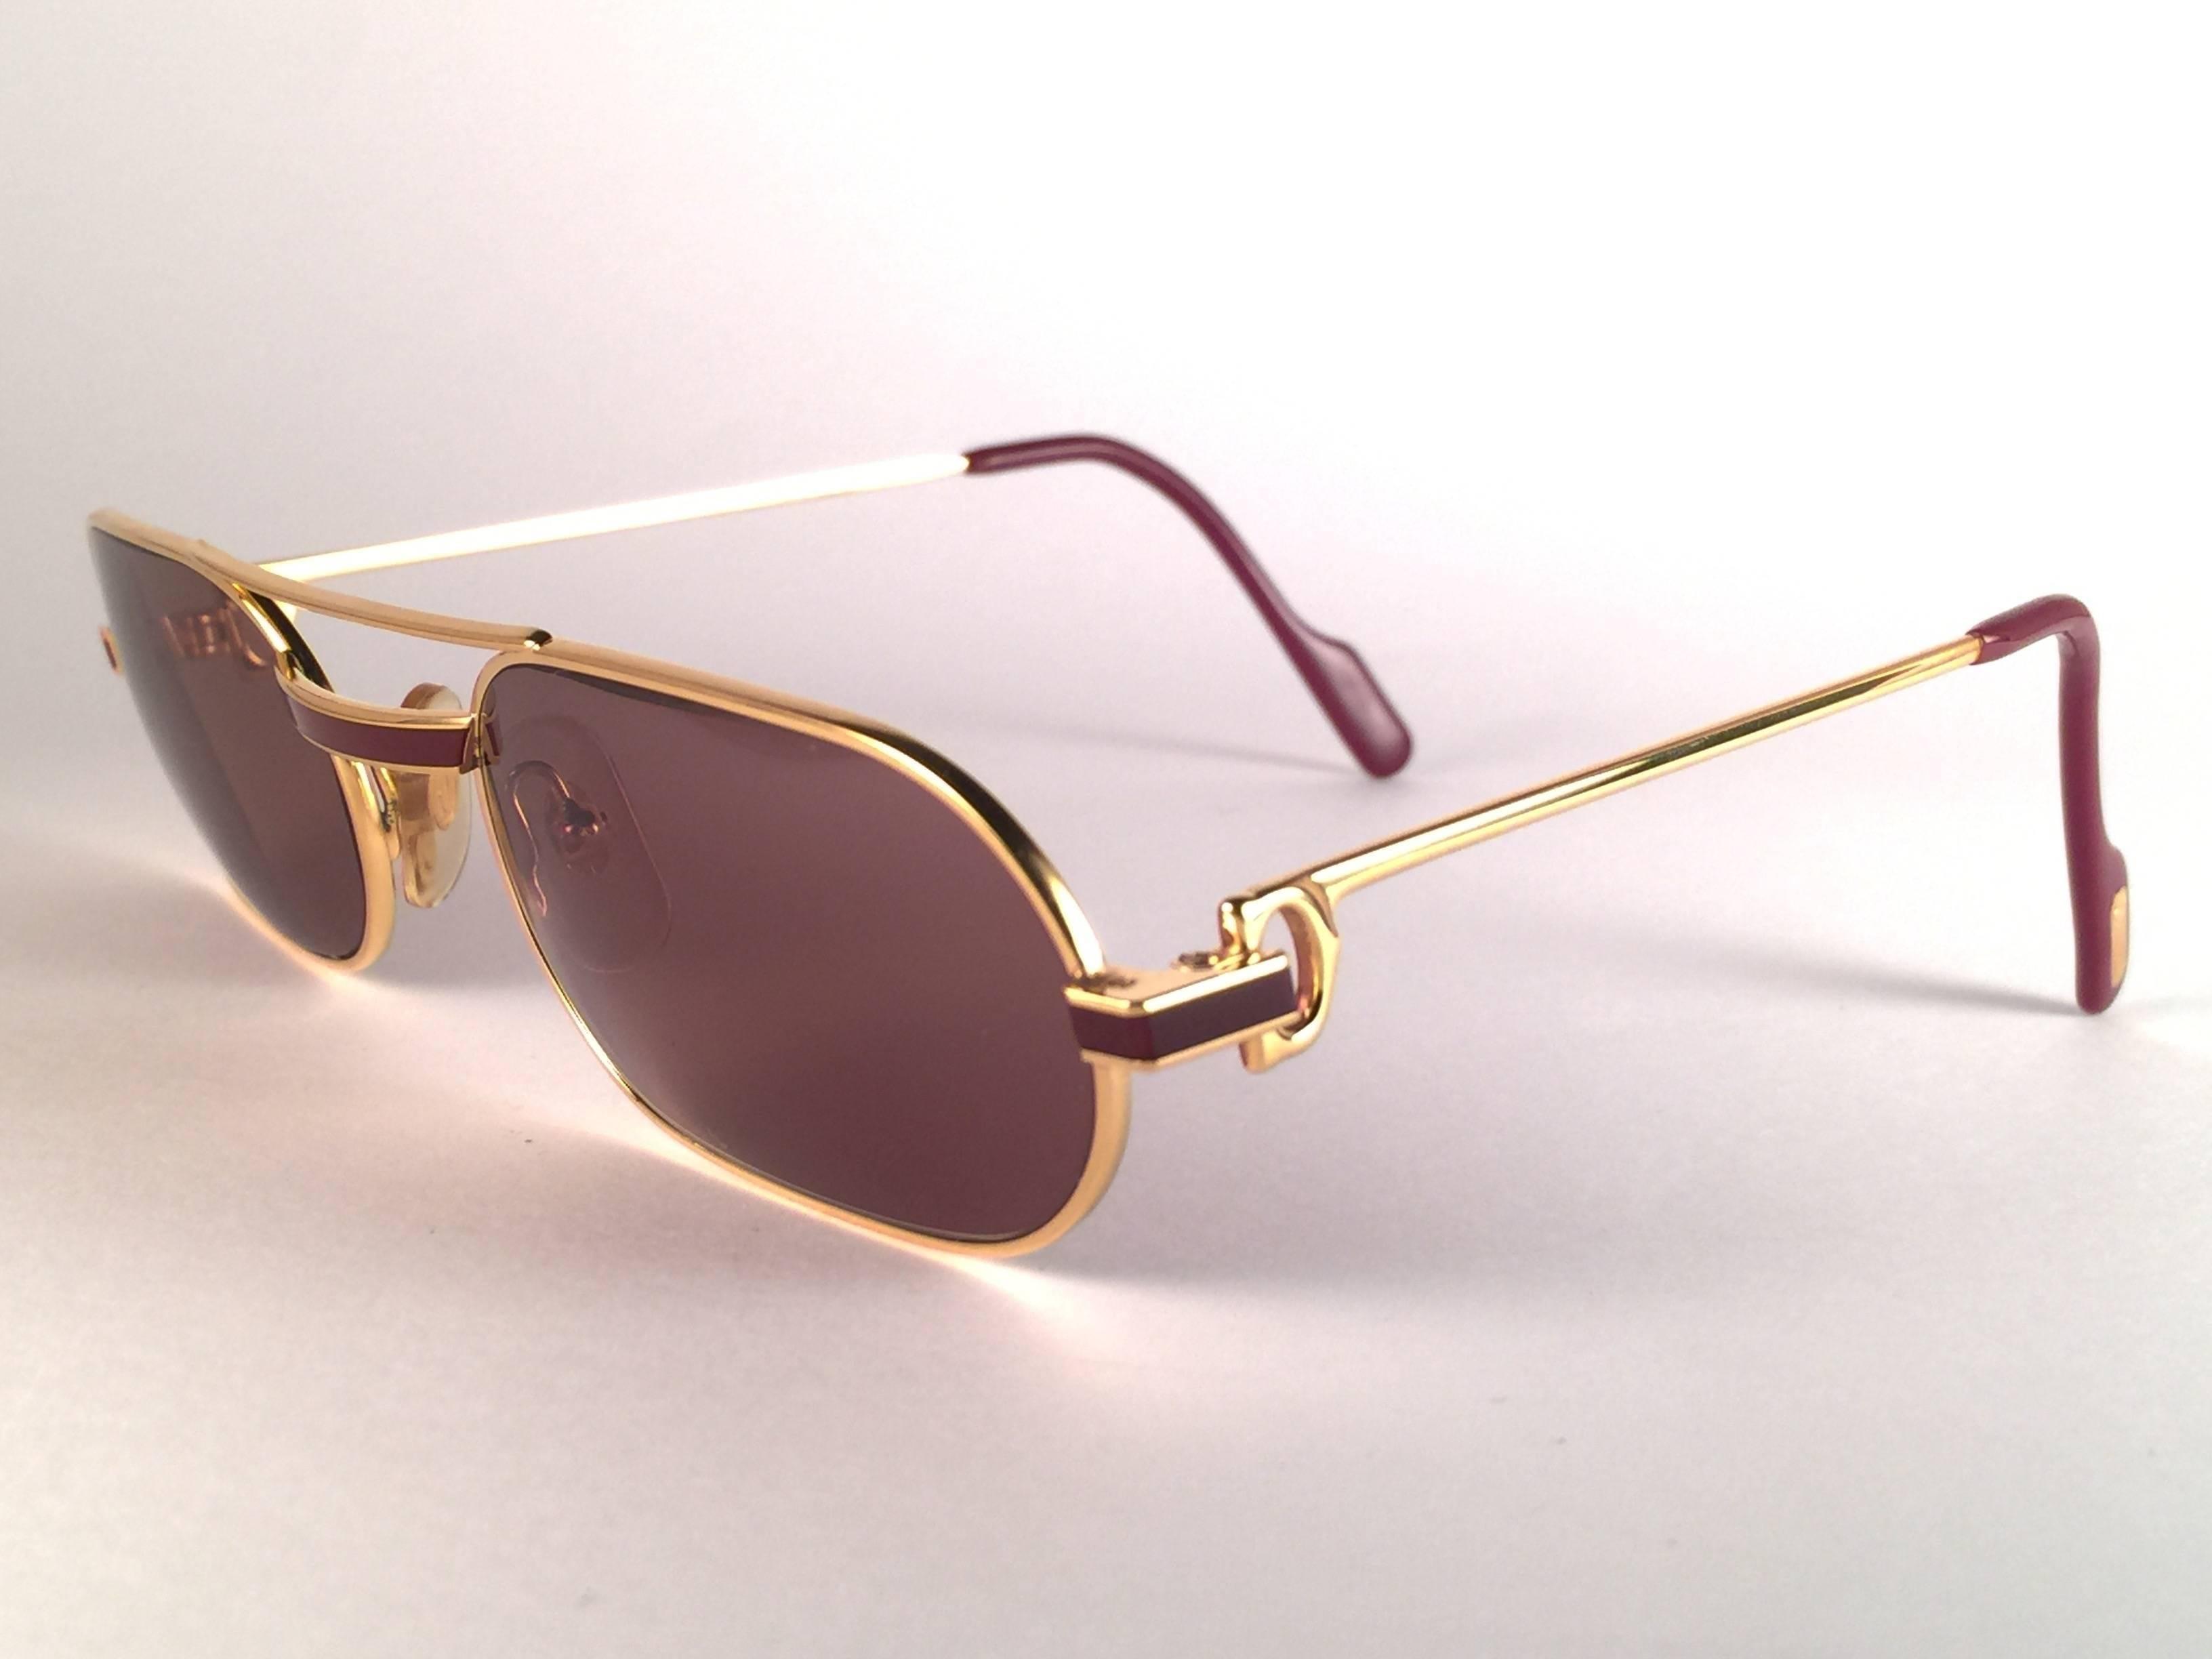 22e24973638a New Vintage Cartier Louis Laque De Chine Medium 55mm France Sunglasses at  1stdibs